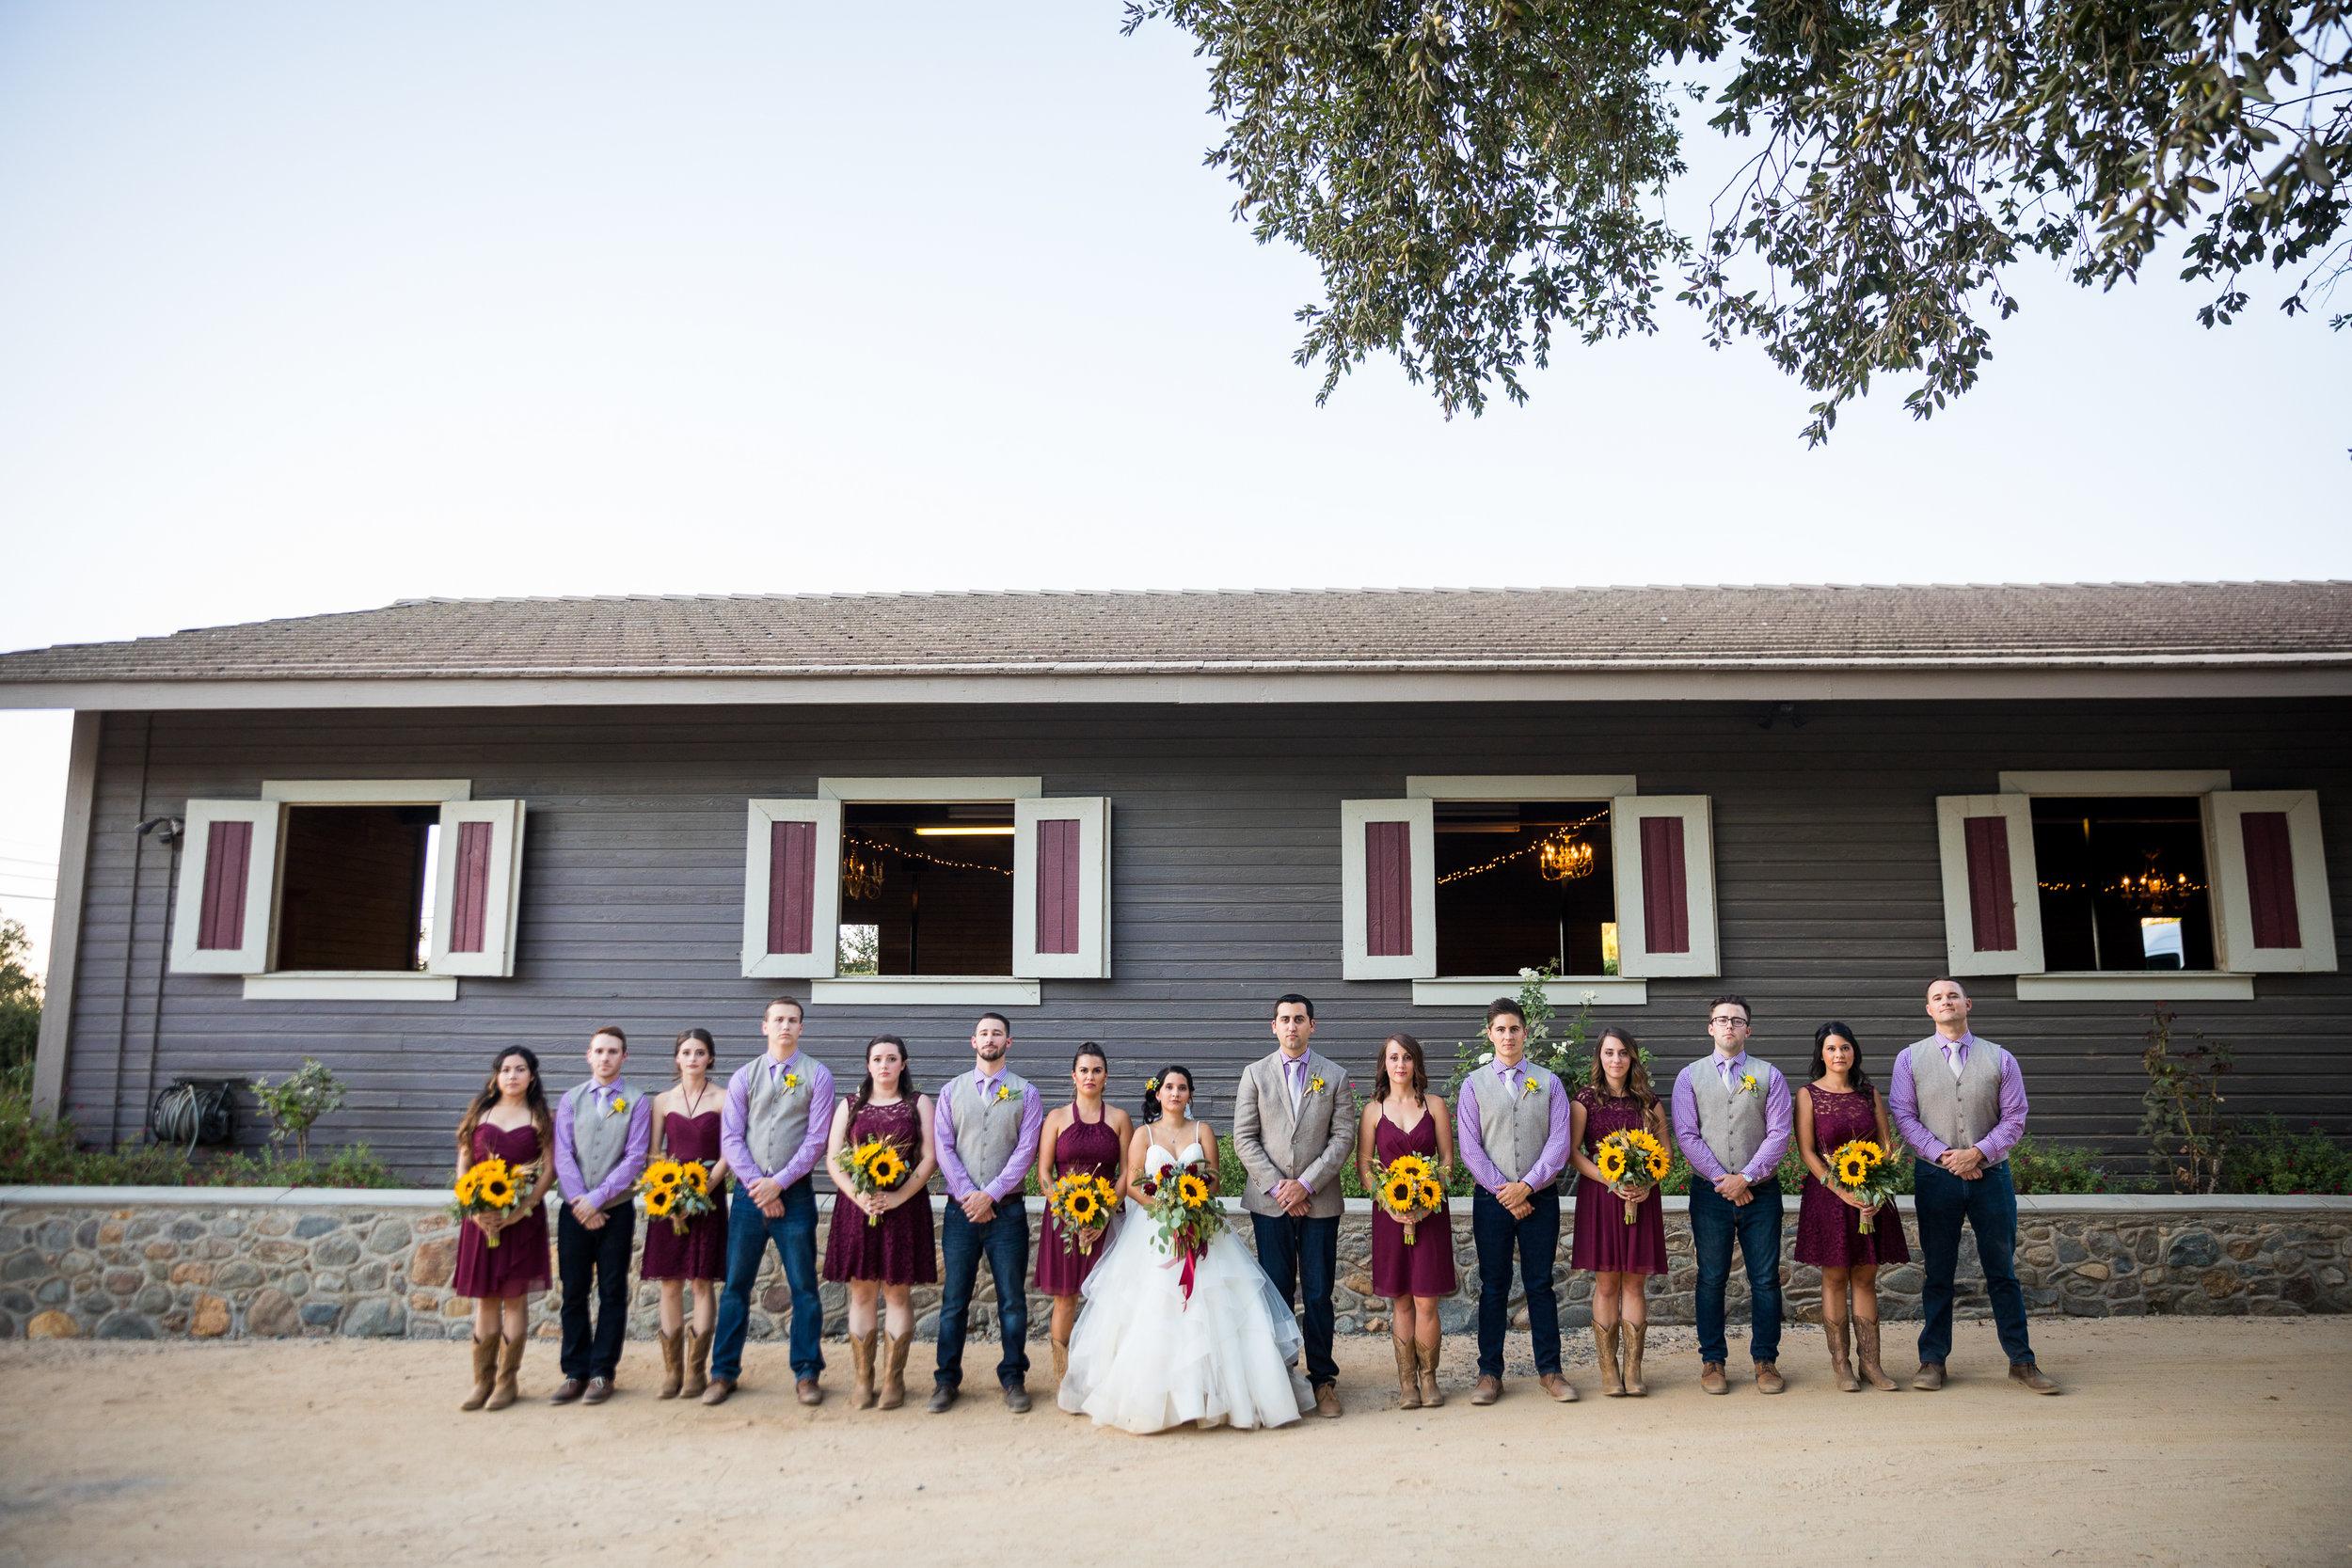 Johnson Wedding_Bridal Party + Romantics-15.jpg